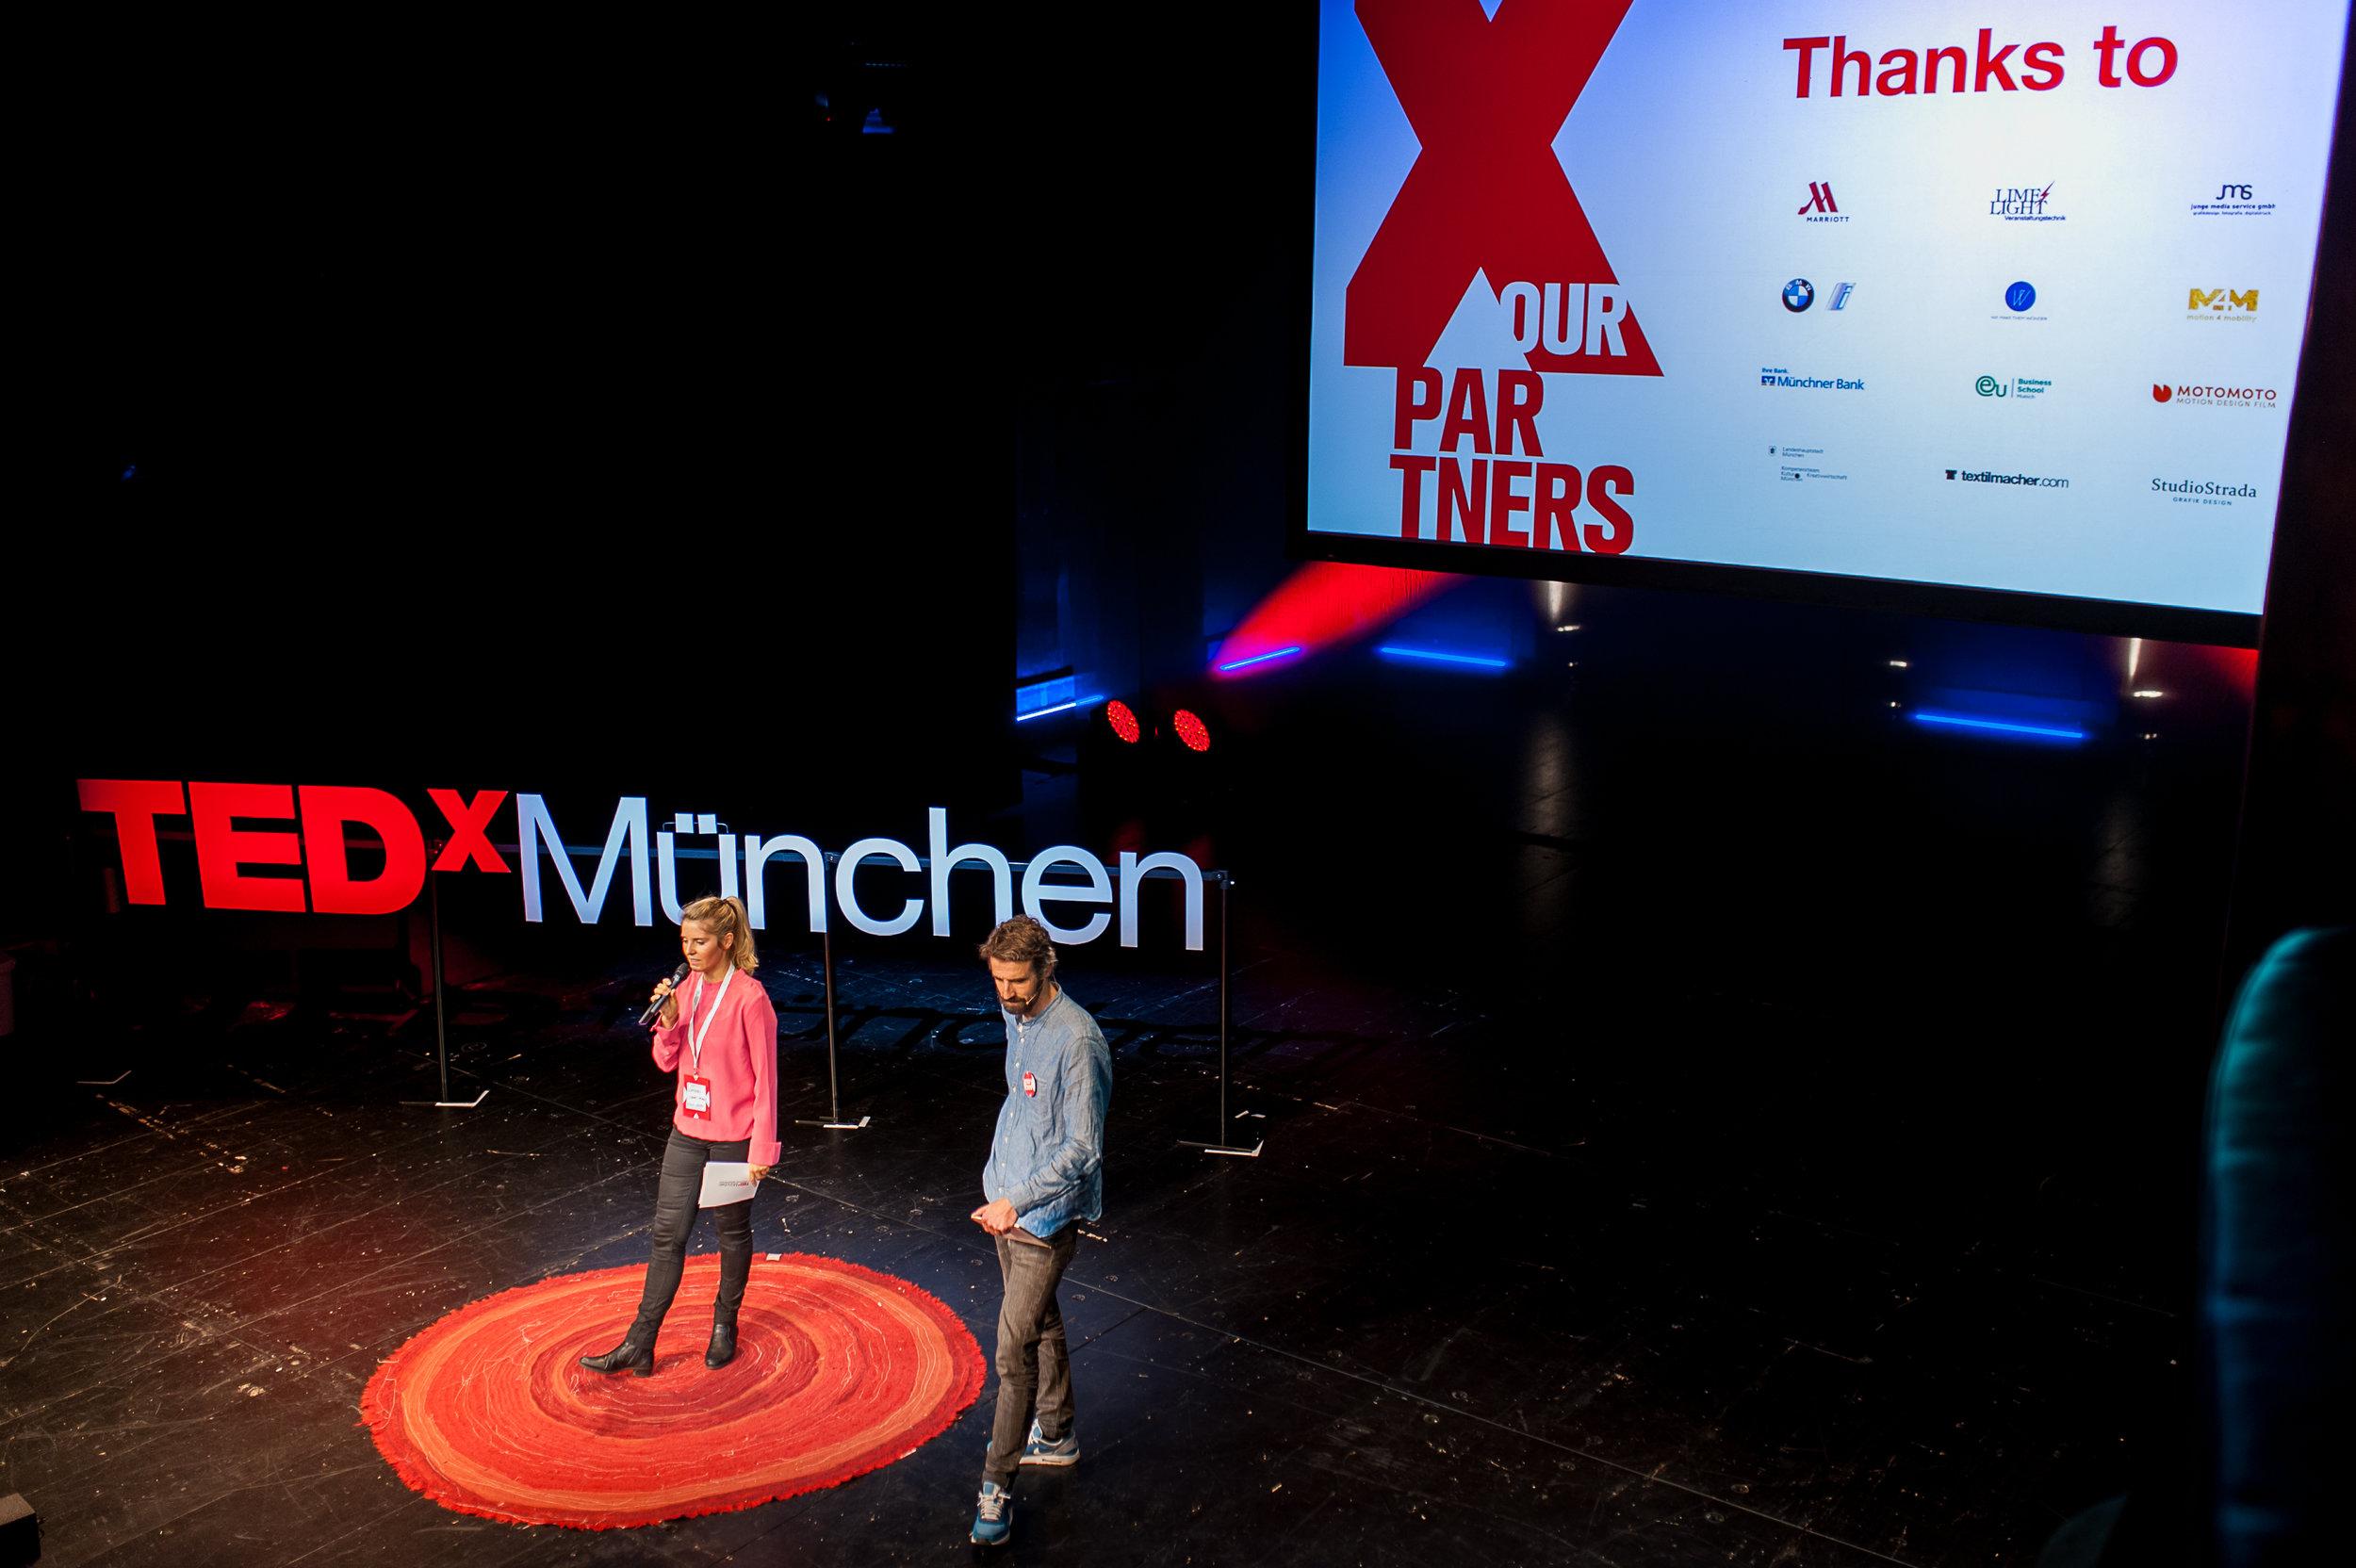 TEDx2017-171119-144.jpg